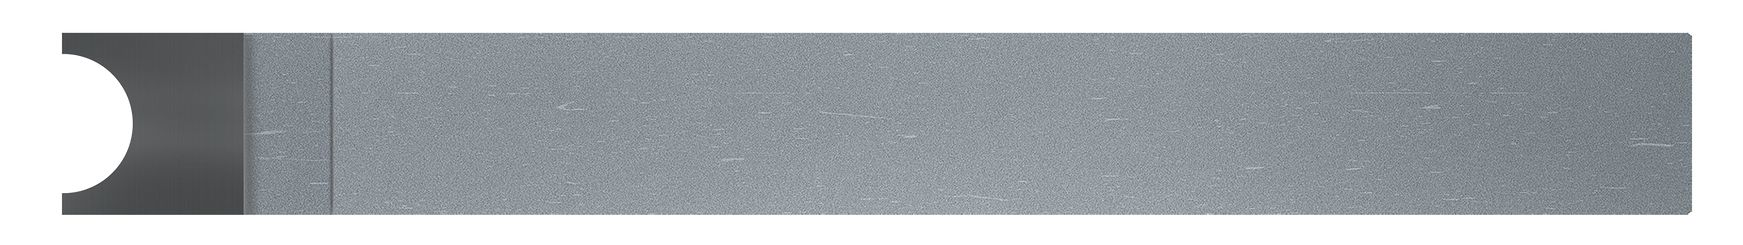 Brazed - Forming Tools - CRT Style - Full Radius (Concave)